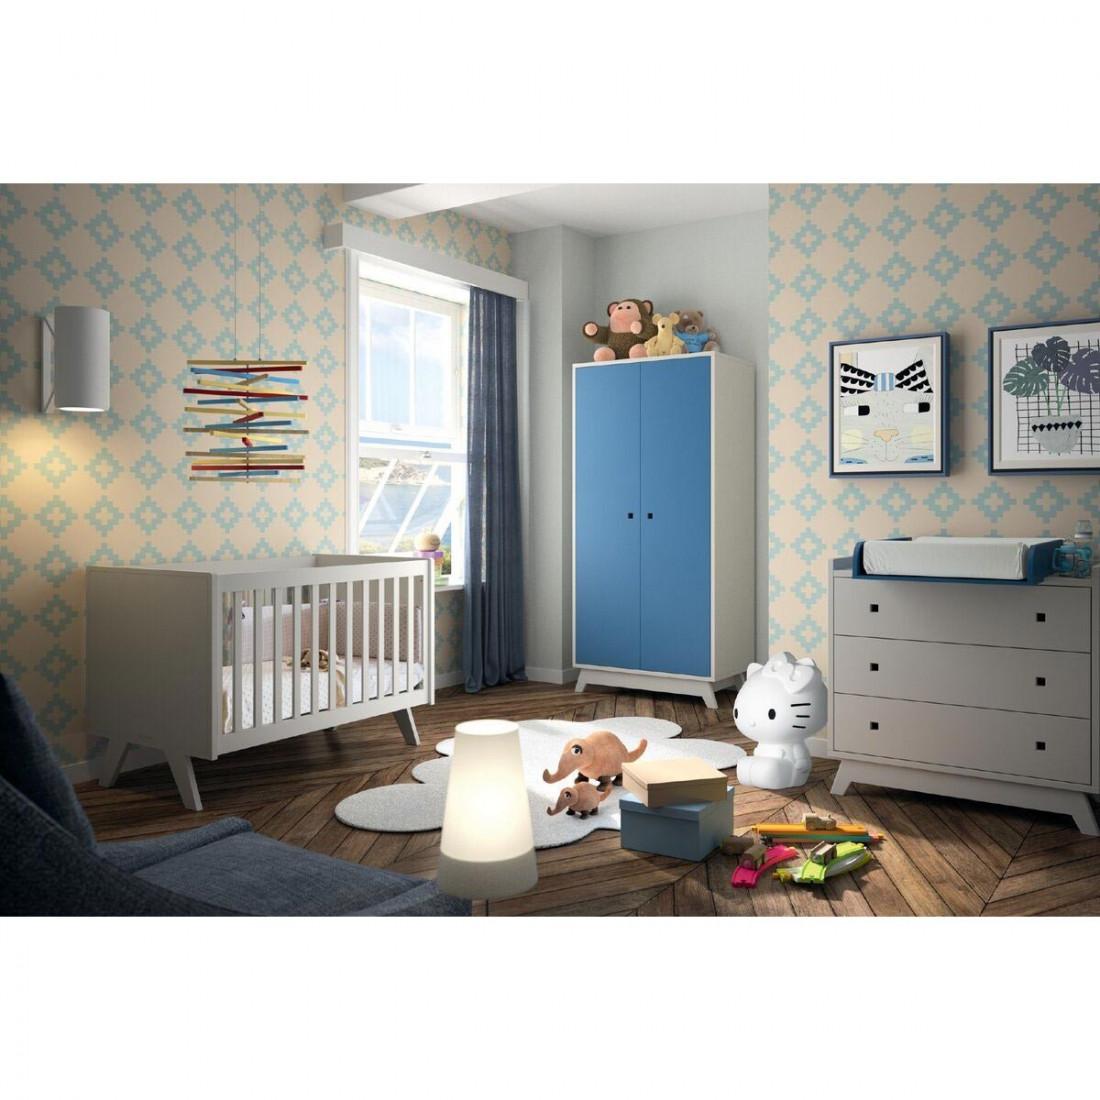 lit b b madavin mathy by bols ma chambramoi. Black Bedroom Furniture Sets. Home Design Ideas